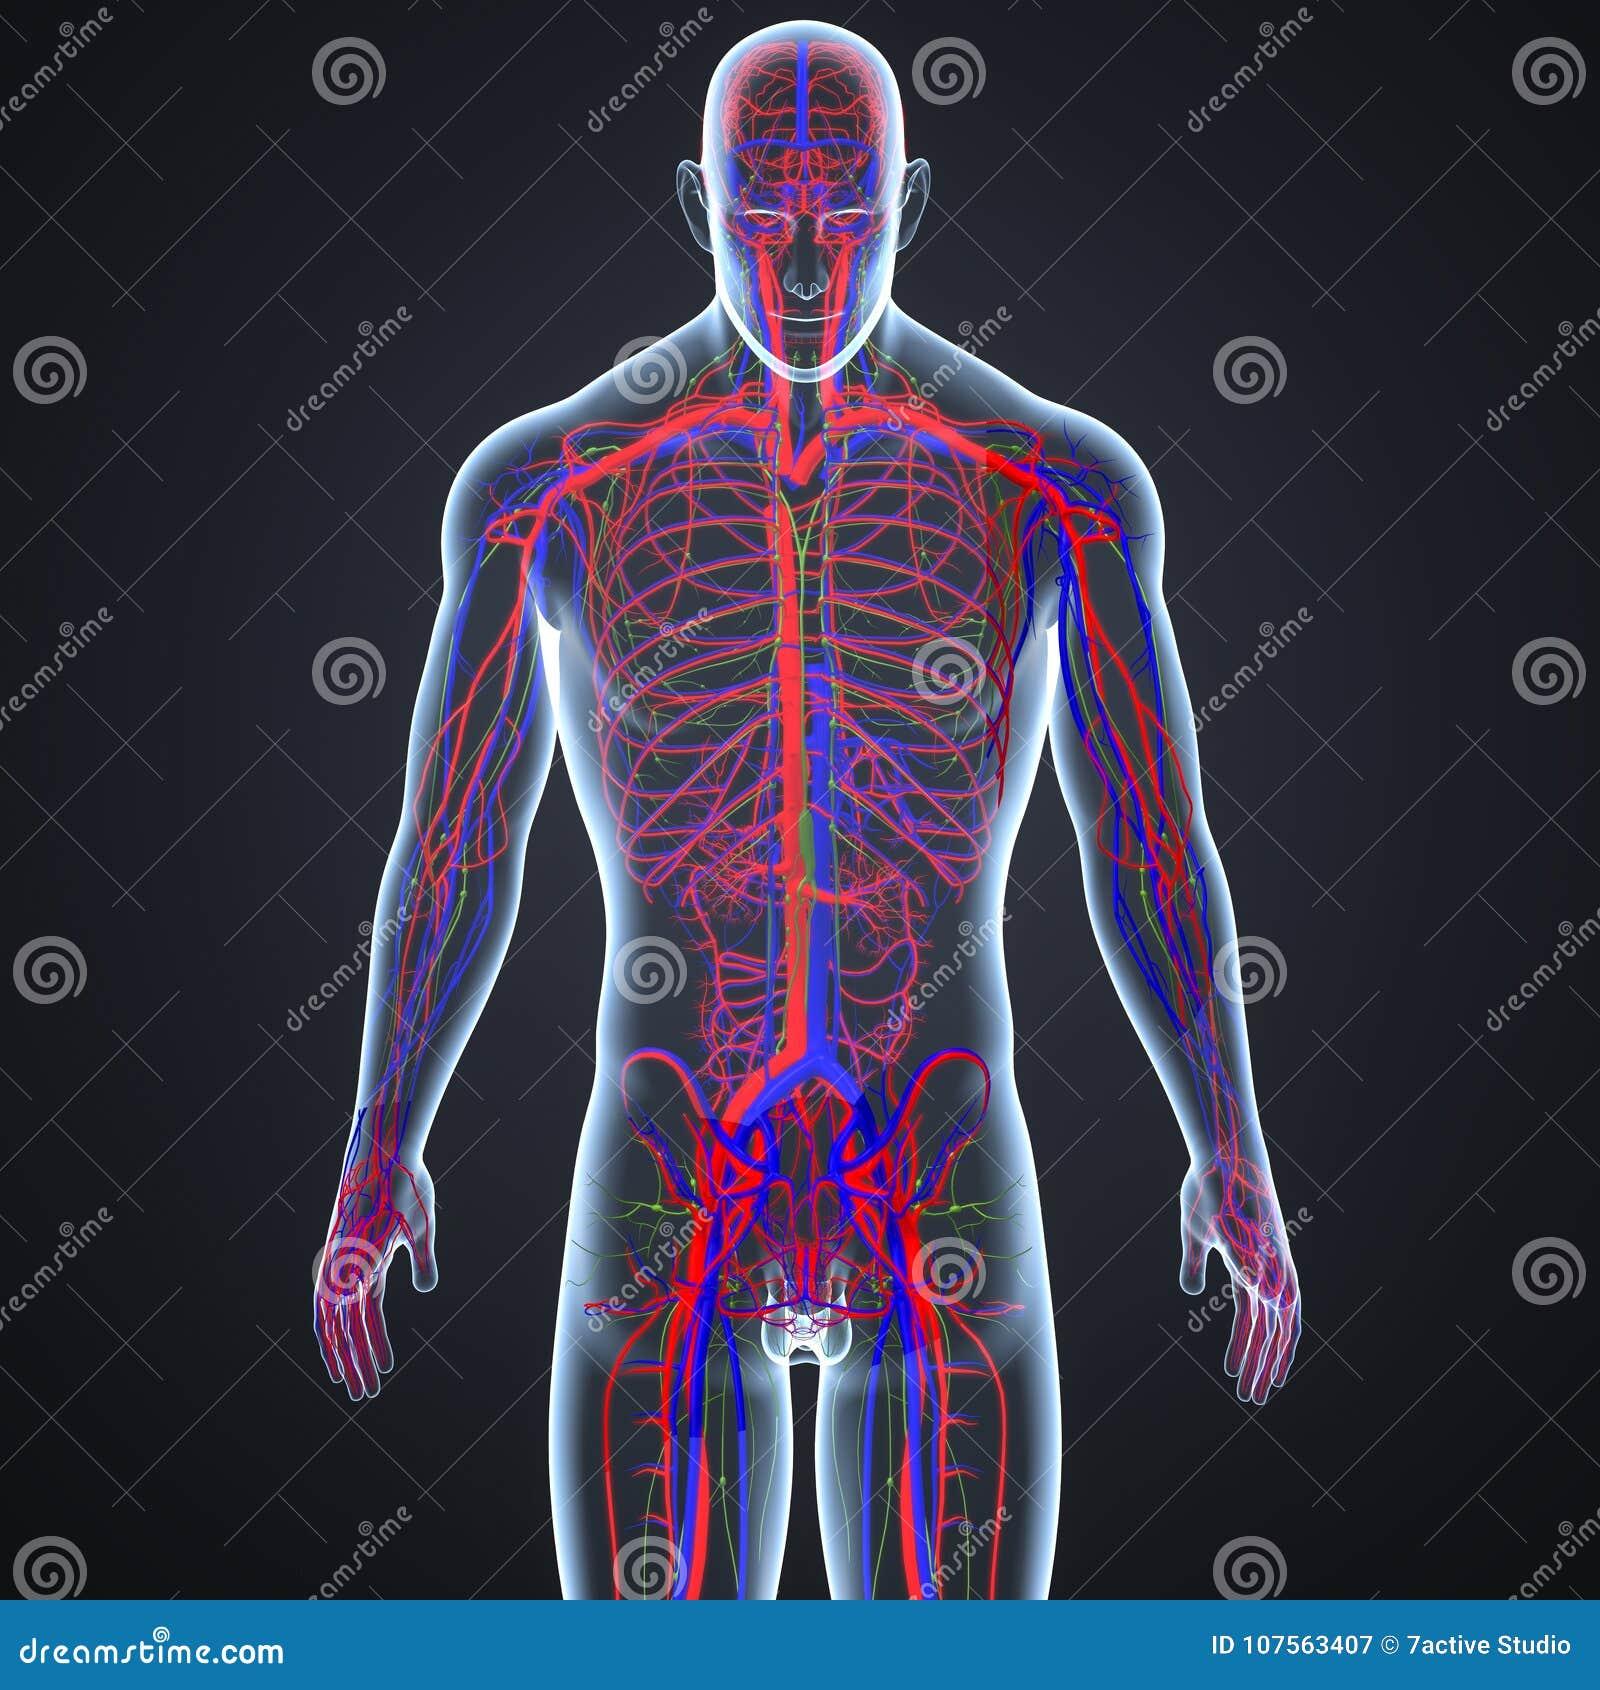 Slagaders, Aders en lymfeknopen in Menselijk Lichaams Voorafgaande mening